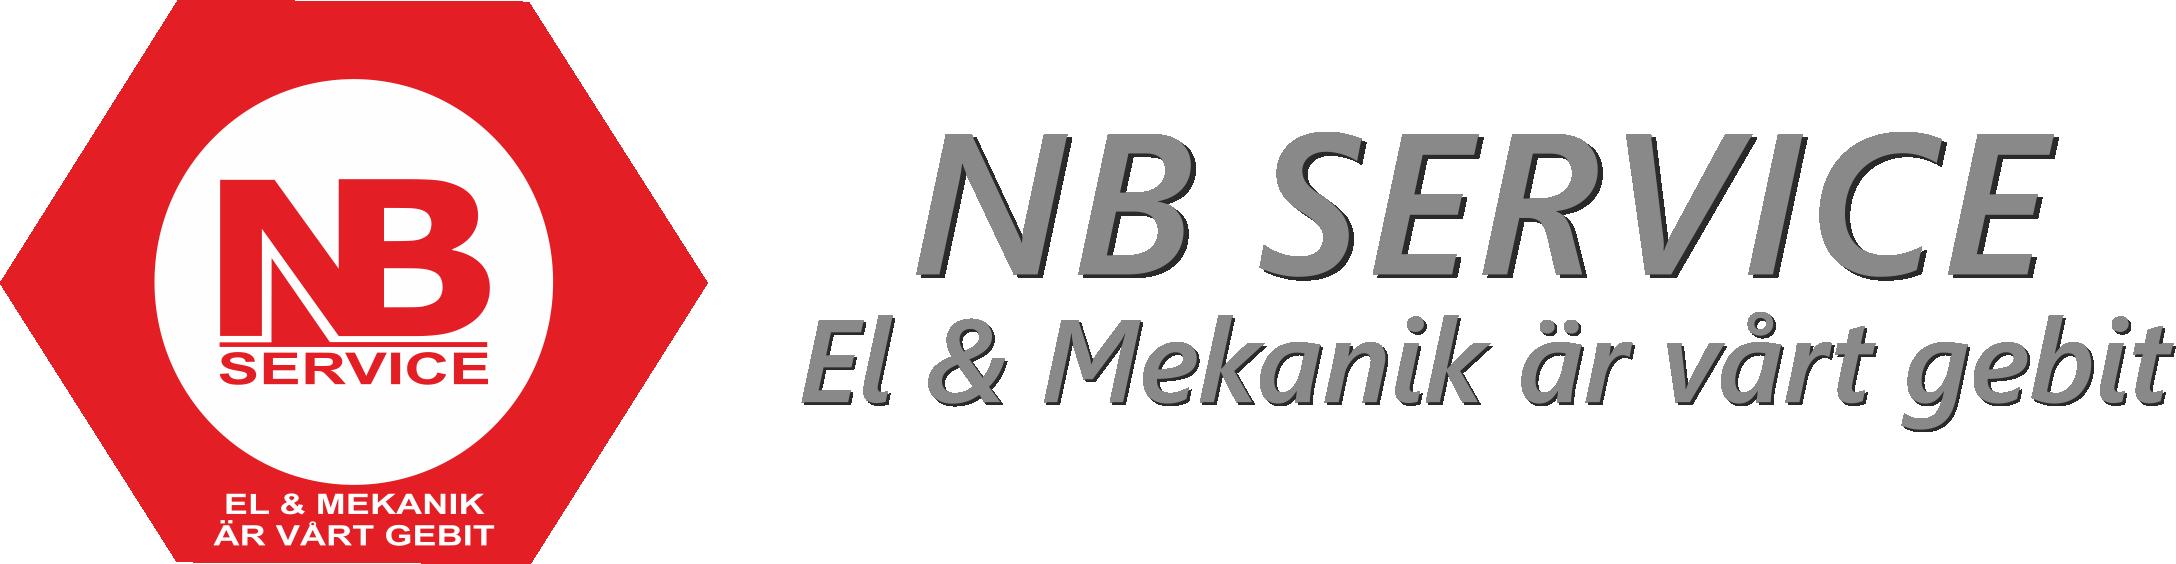 NB SERVICE AB Logo